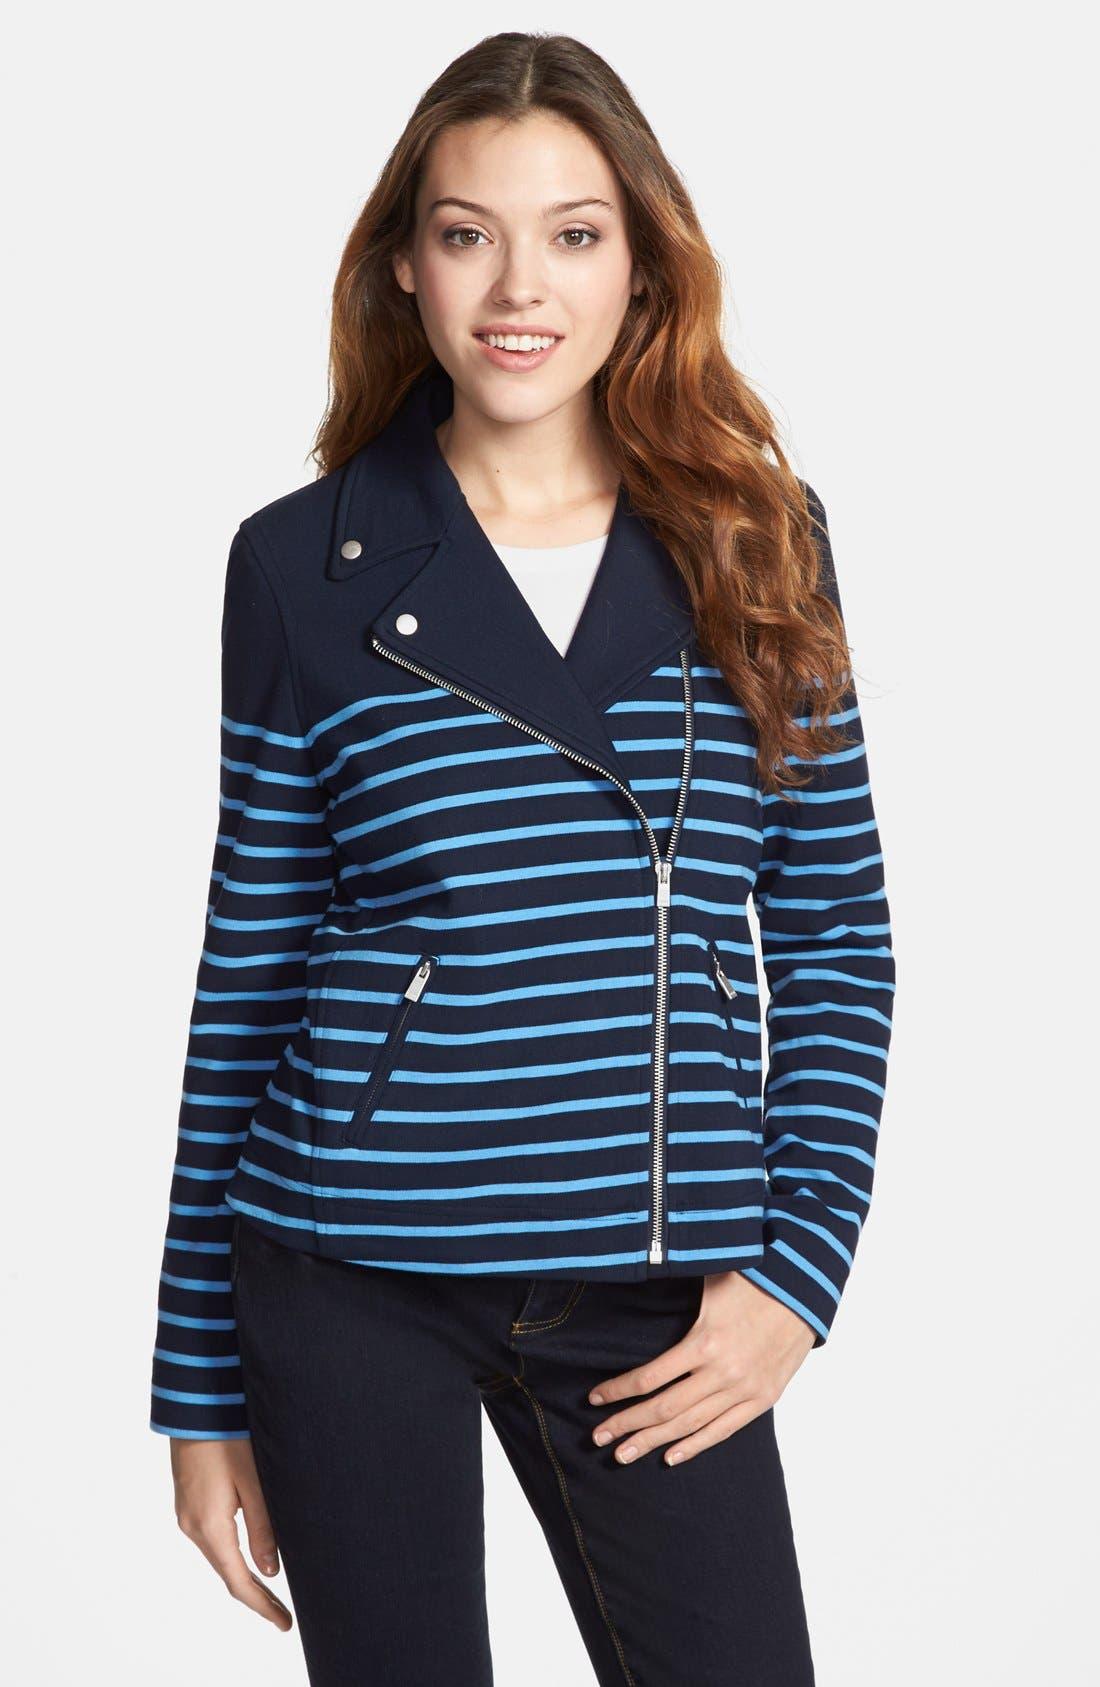 Alternate Image 1 Selected - NYDJ Stripe Ponte Knit Jacket